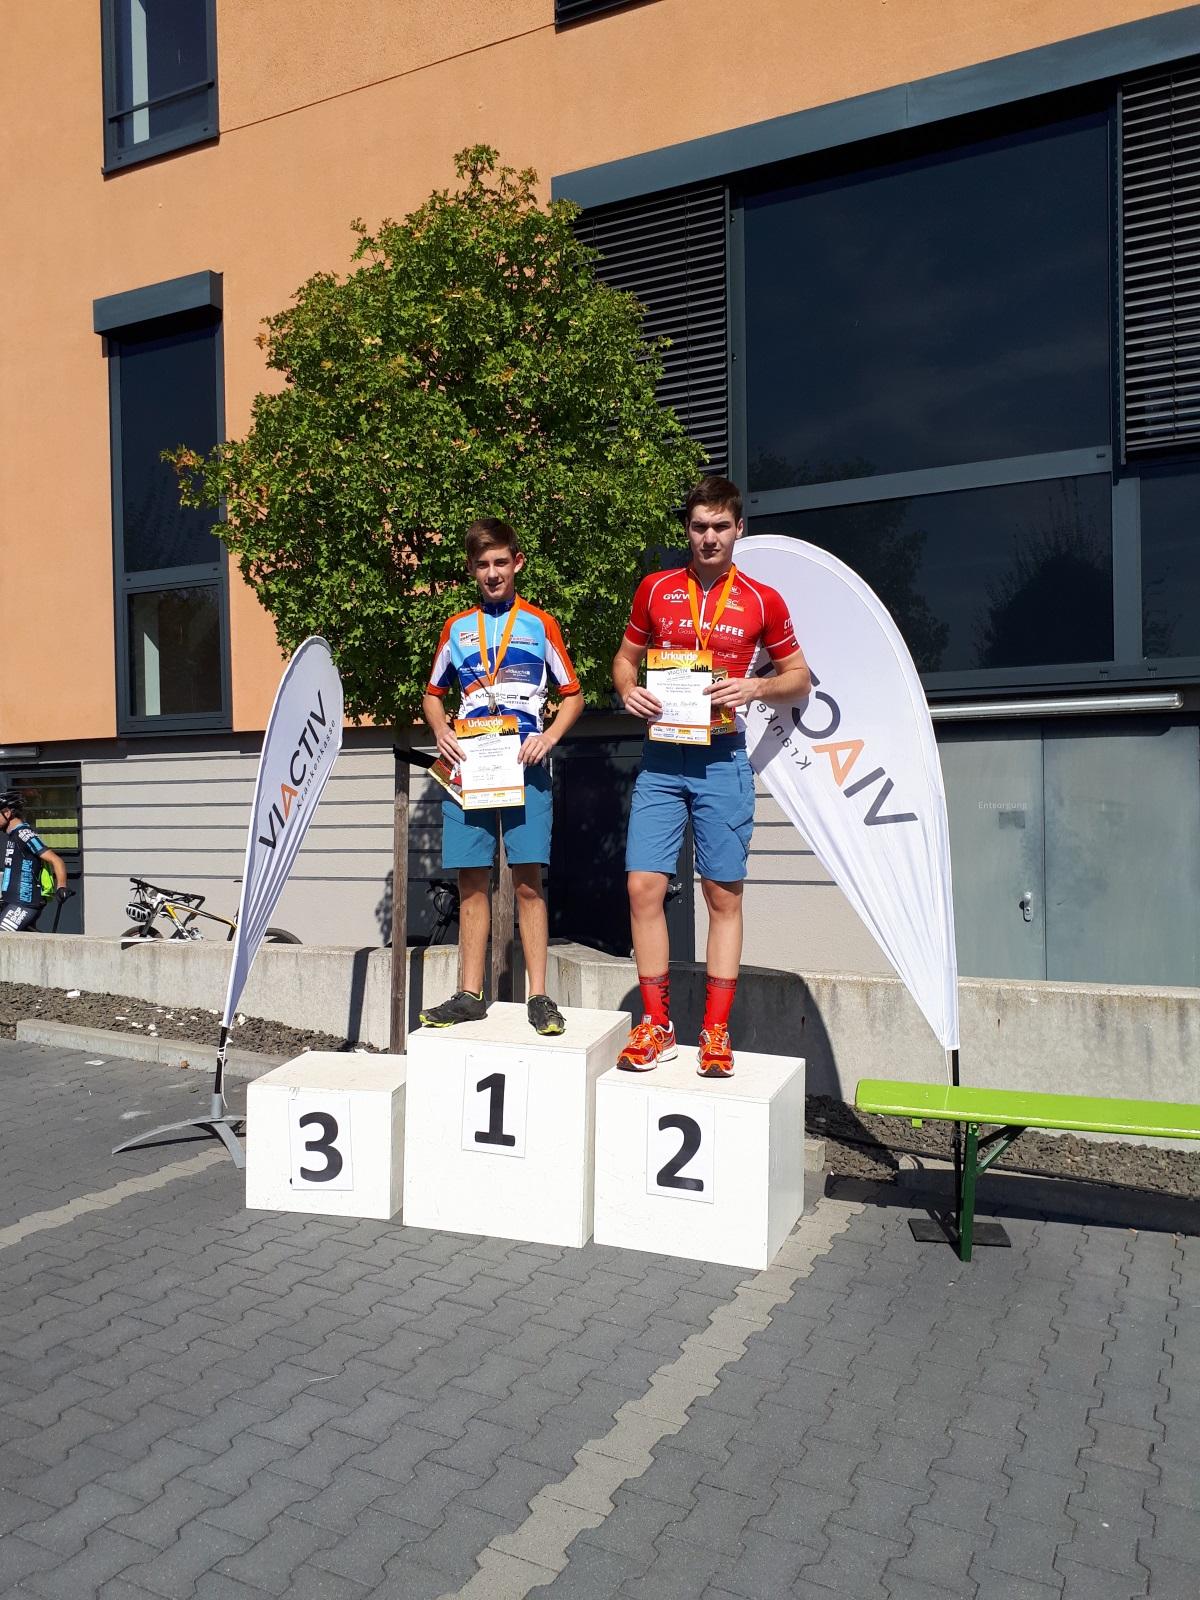 Radsport Silas Joho VfR Waldkatzenbach